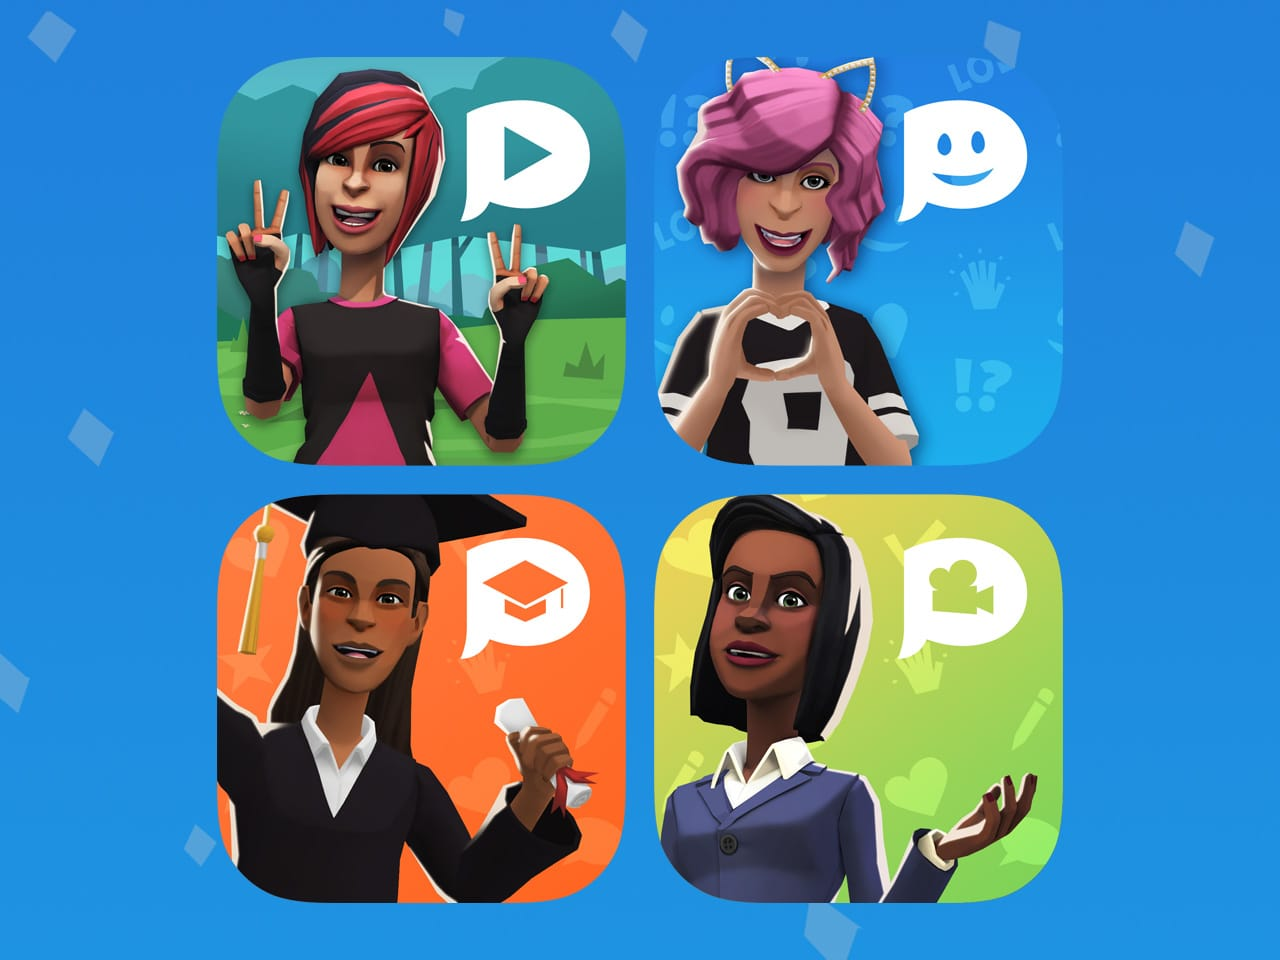 The Plotagon apps